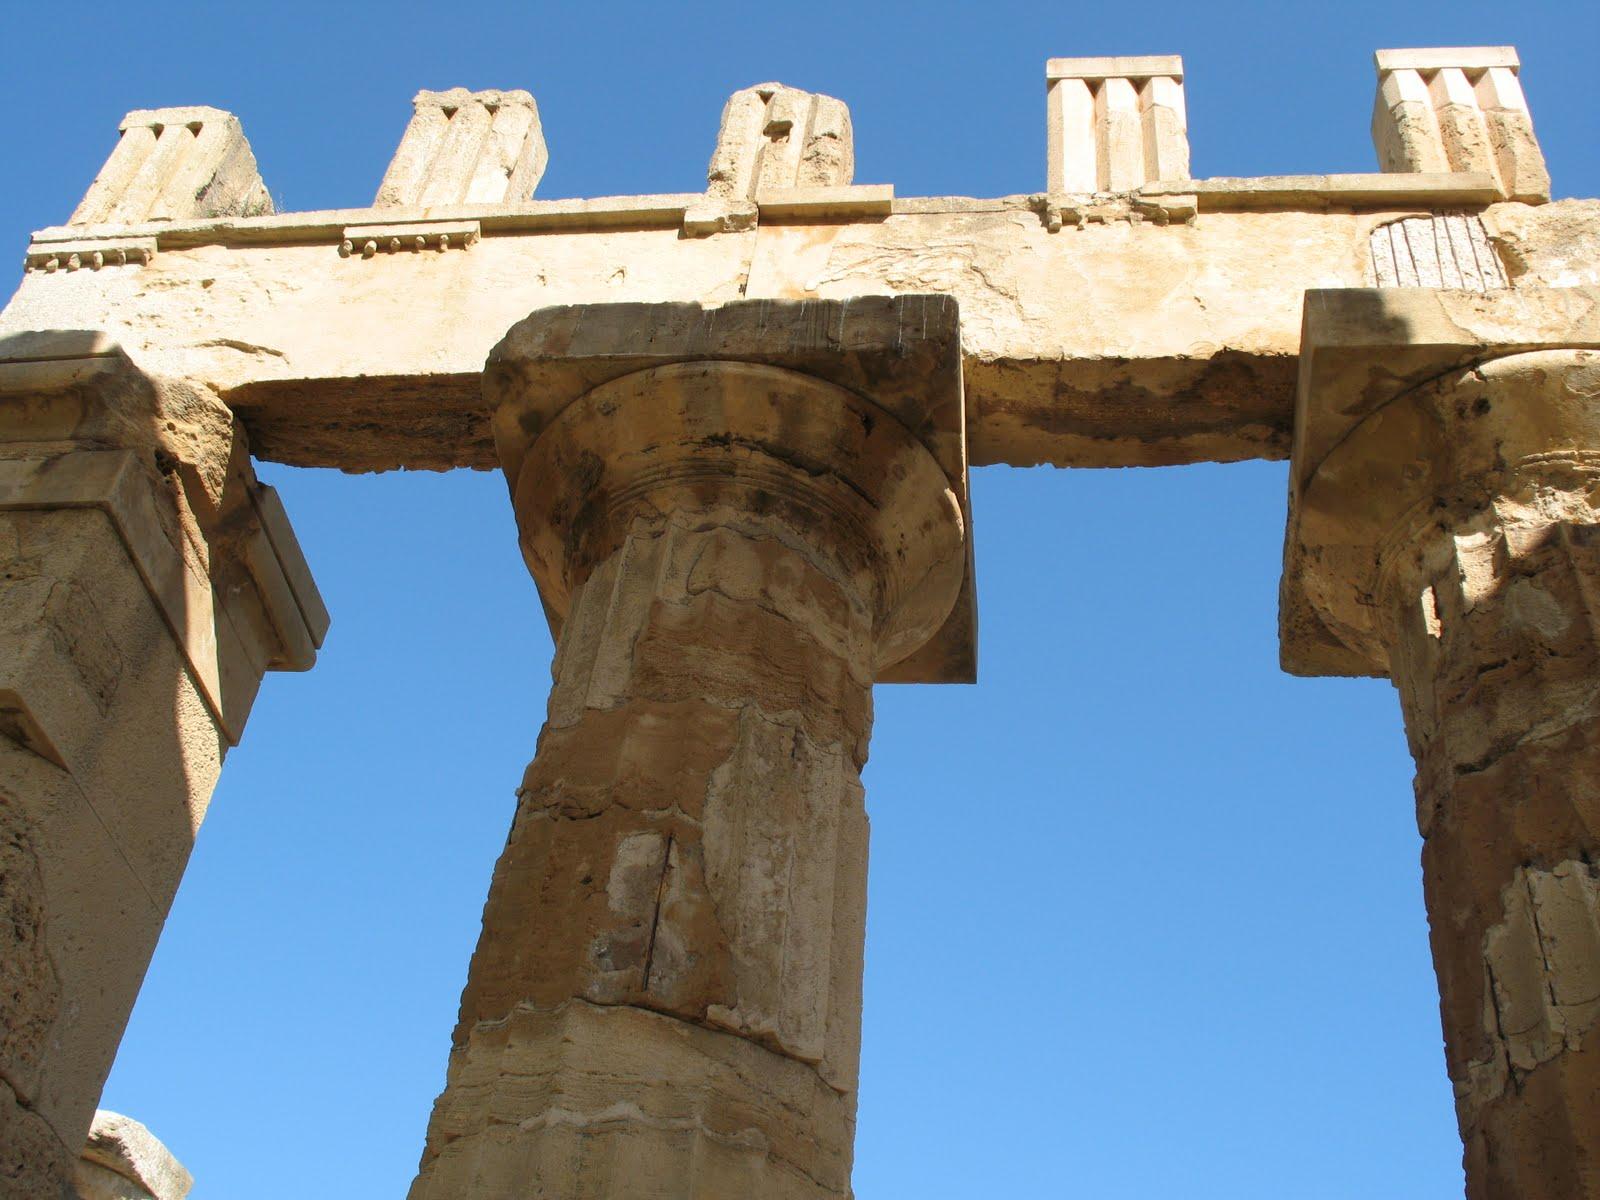 giant-temples-fallen